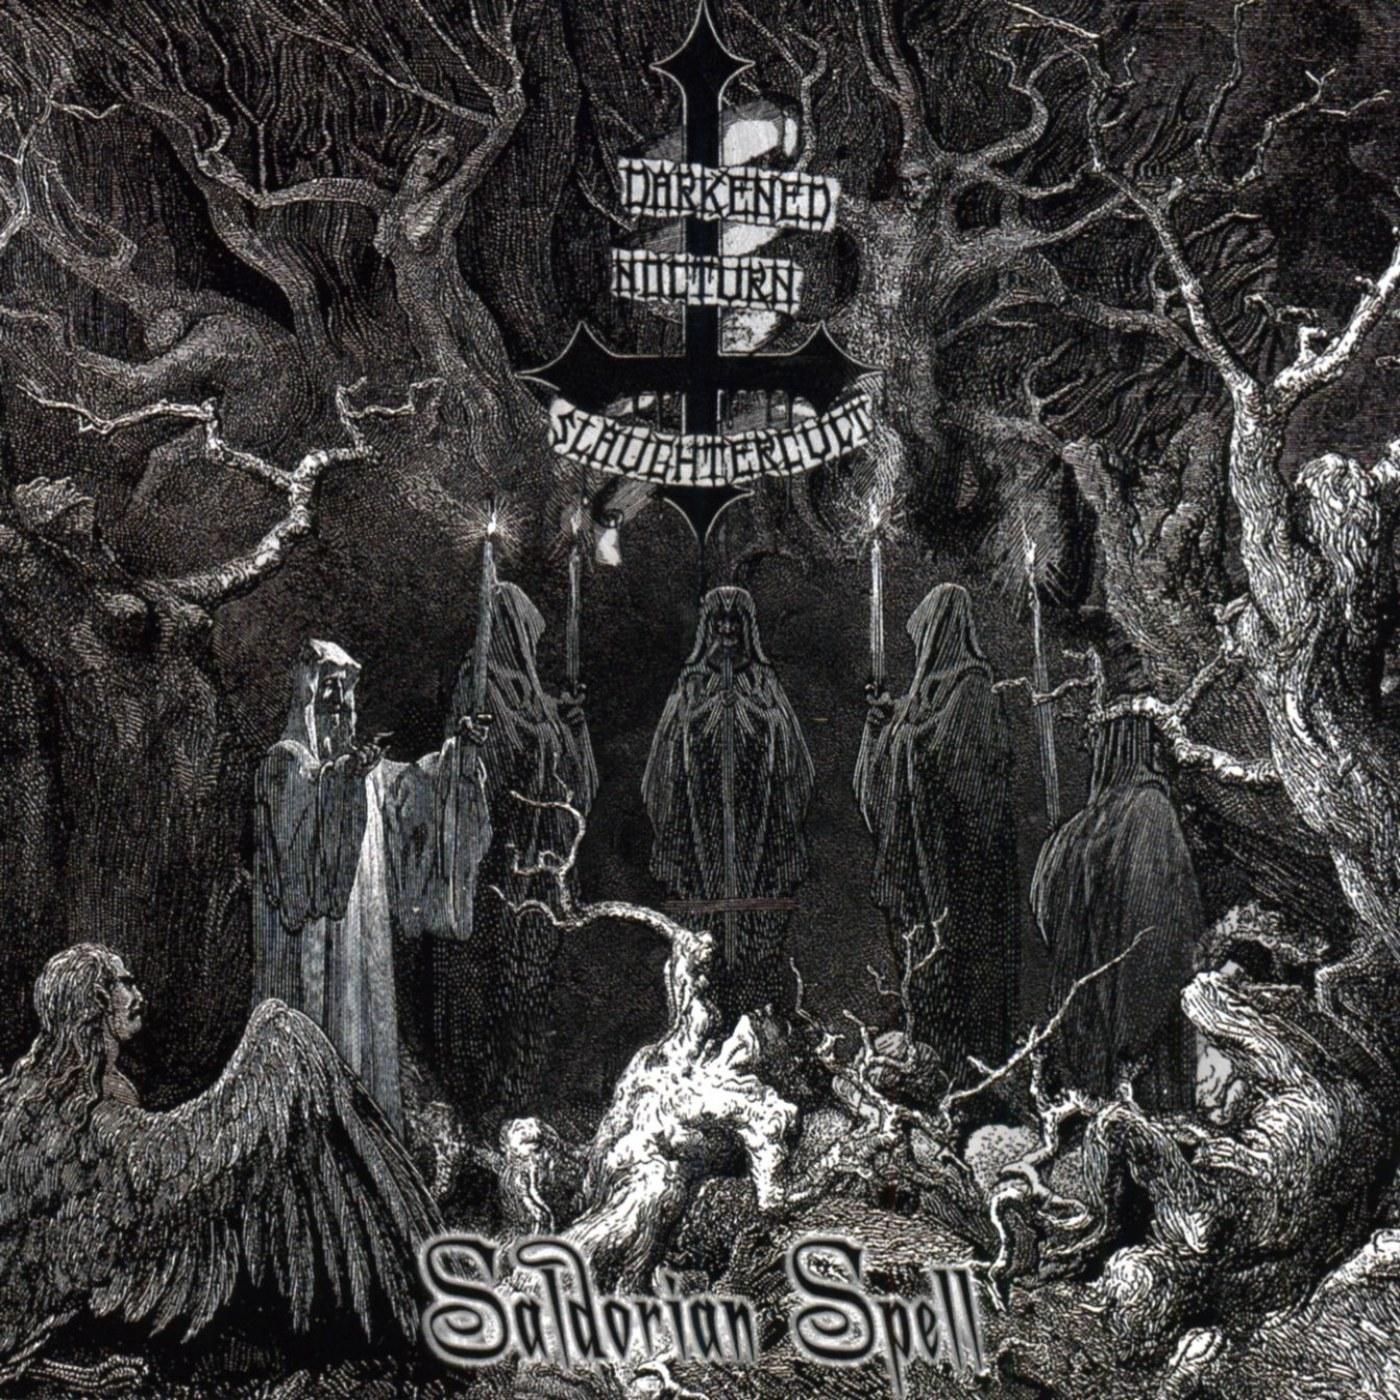 Review for Darkened Nocturn Slaughtercult - Saldorian Spell